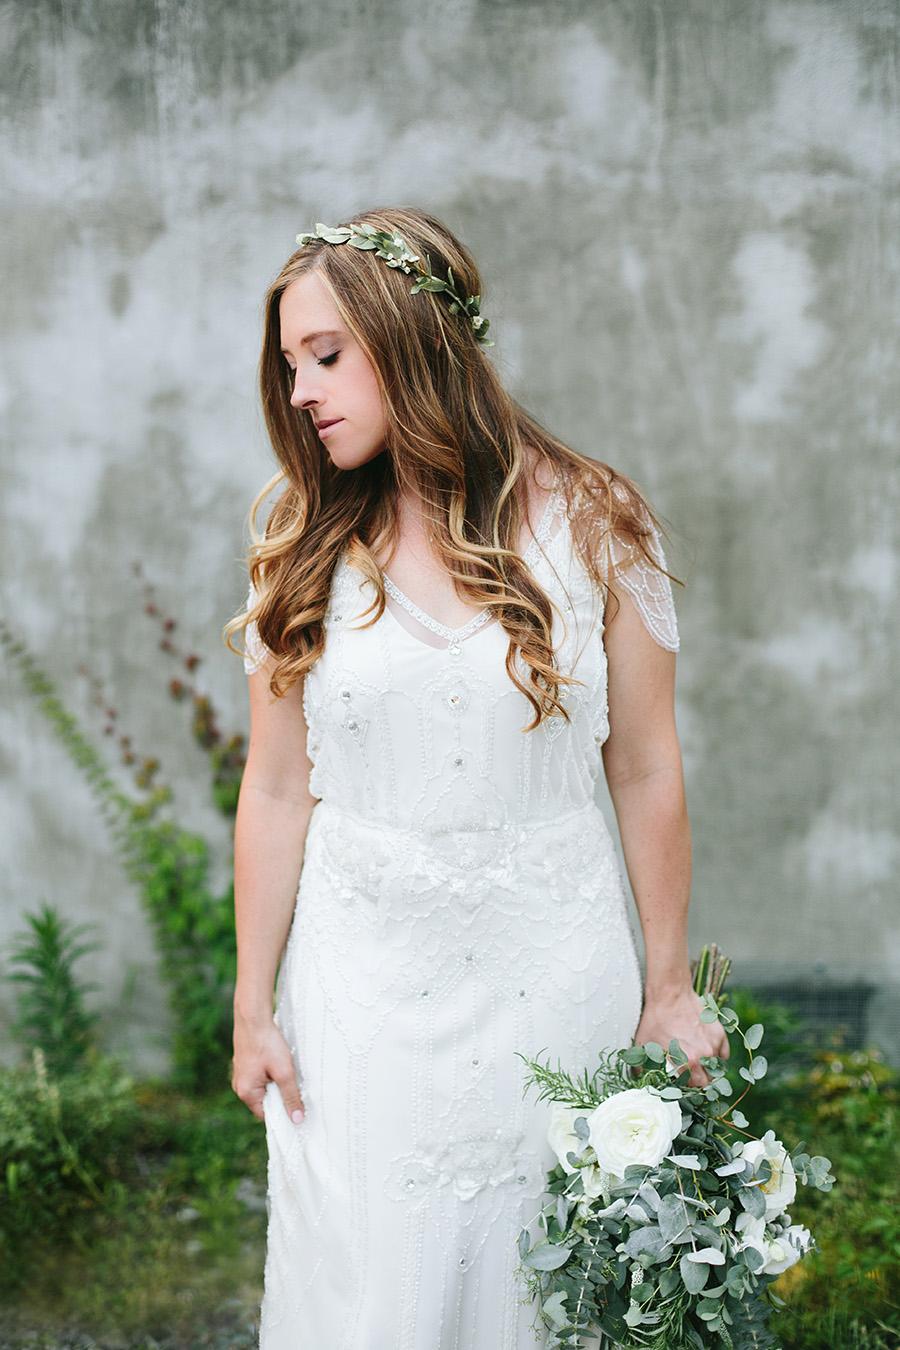 DavisWedding - Alicia White Photography-767.jpg